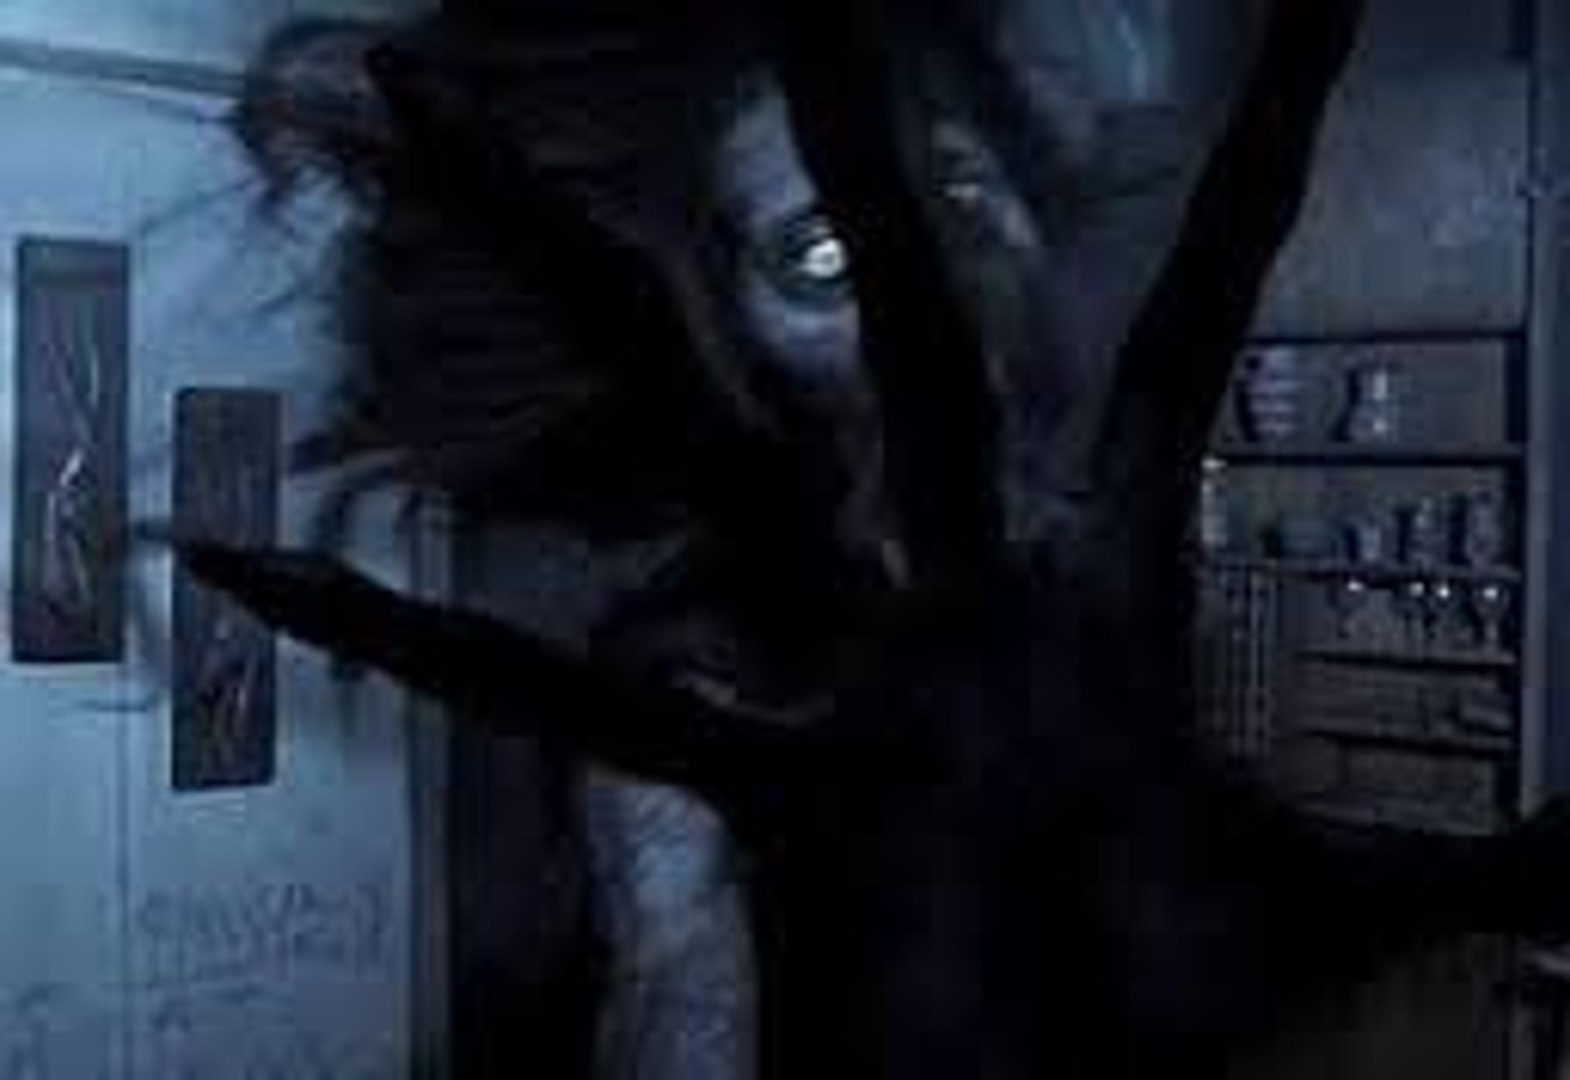 Mama Official Trailer (2012) - Horror Movie